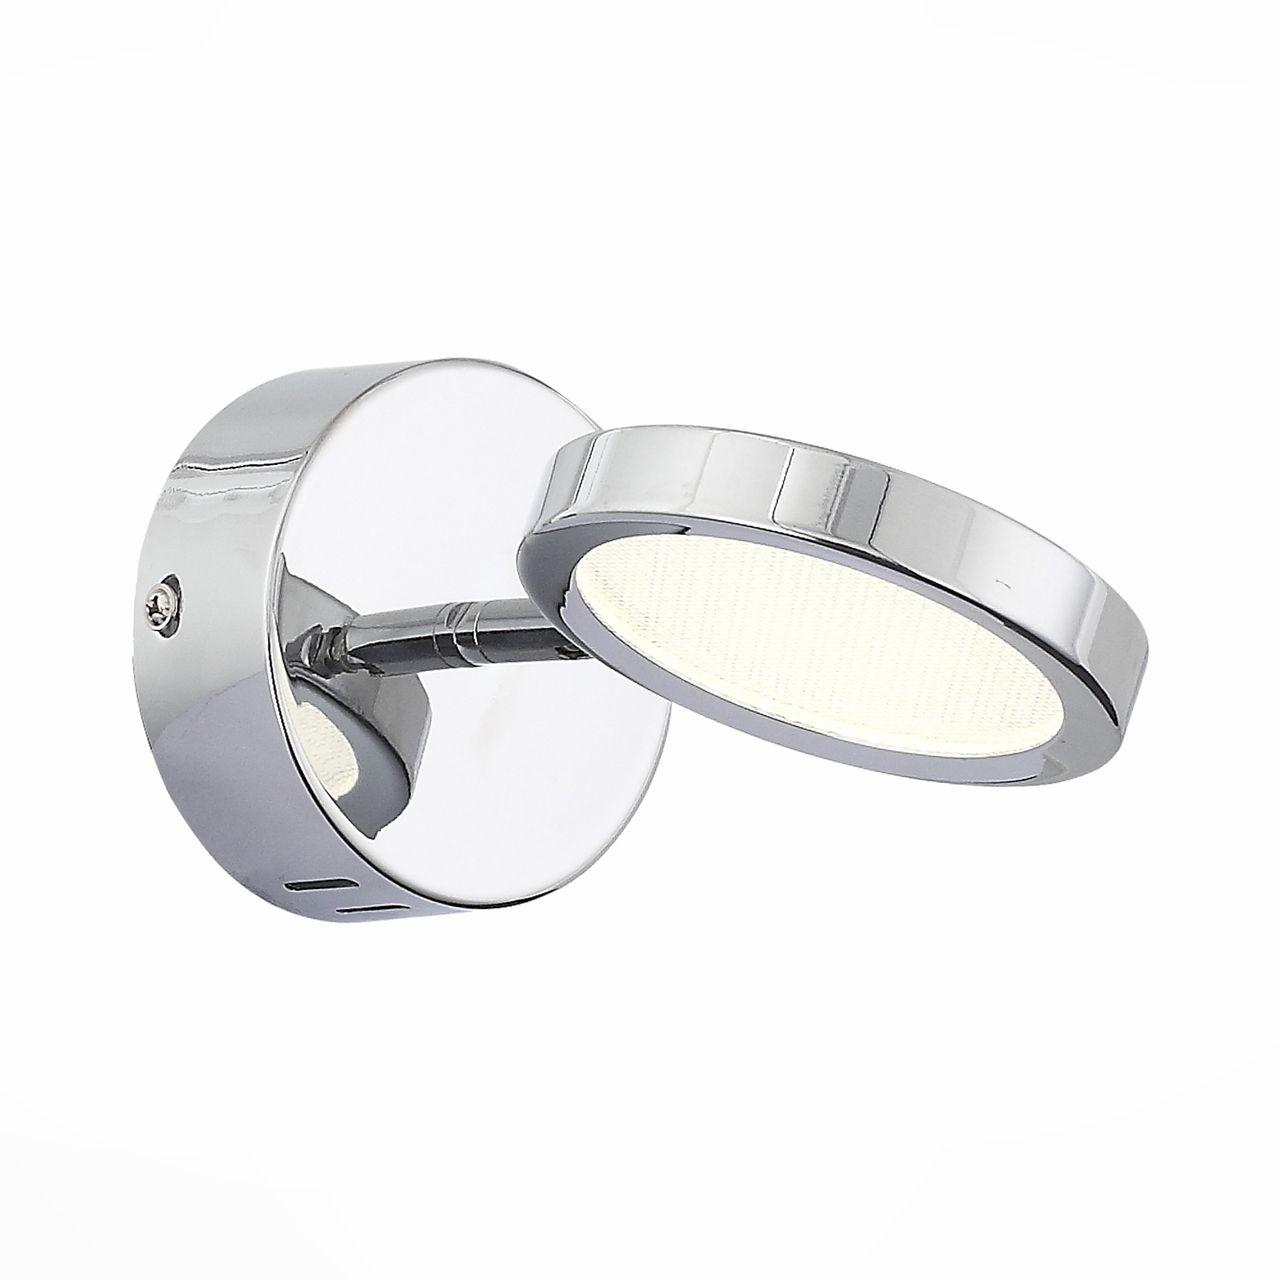 Спот ST Luce, LED, 5 Вт светодиодный спот st luce pratico sle120 101 01